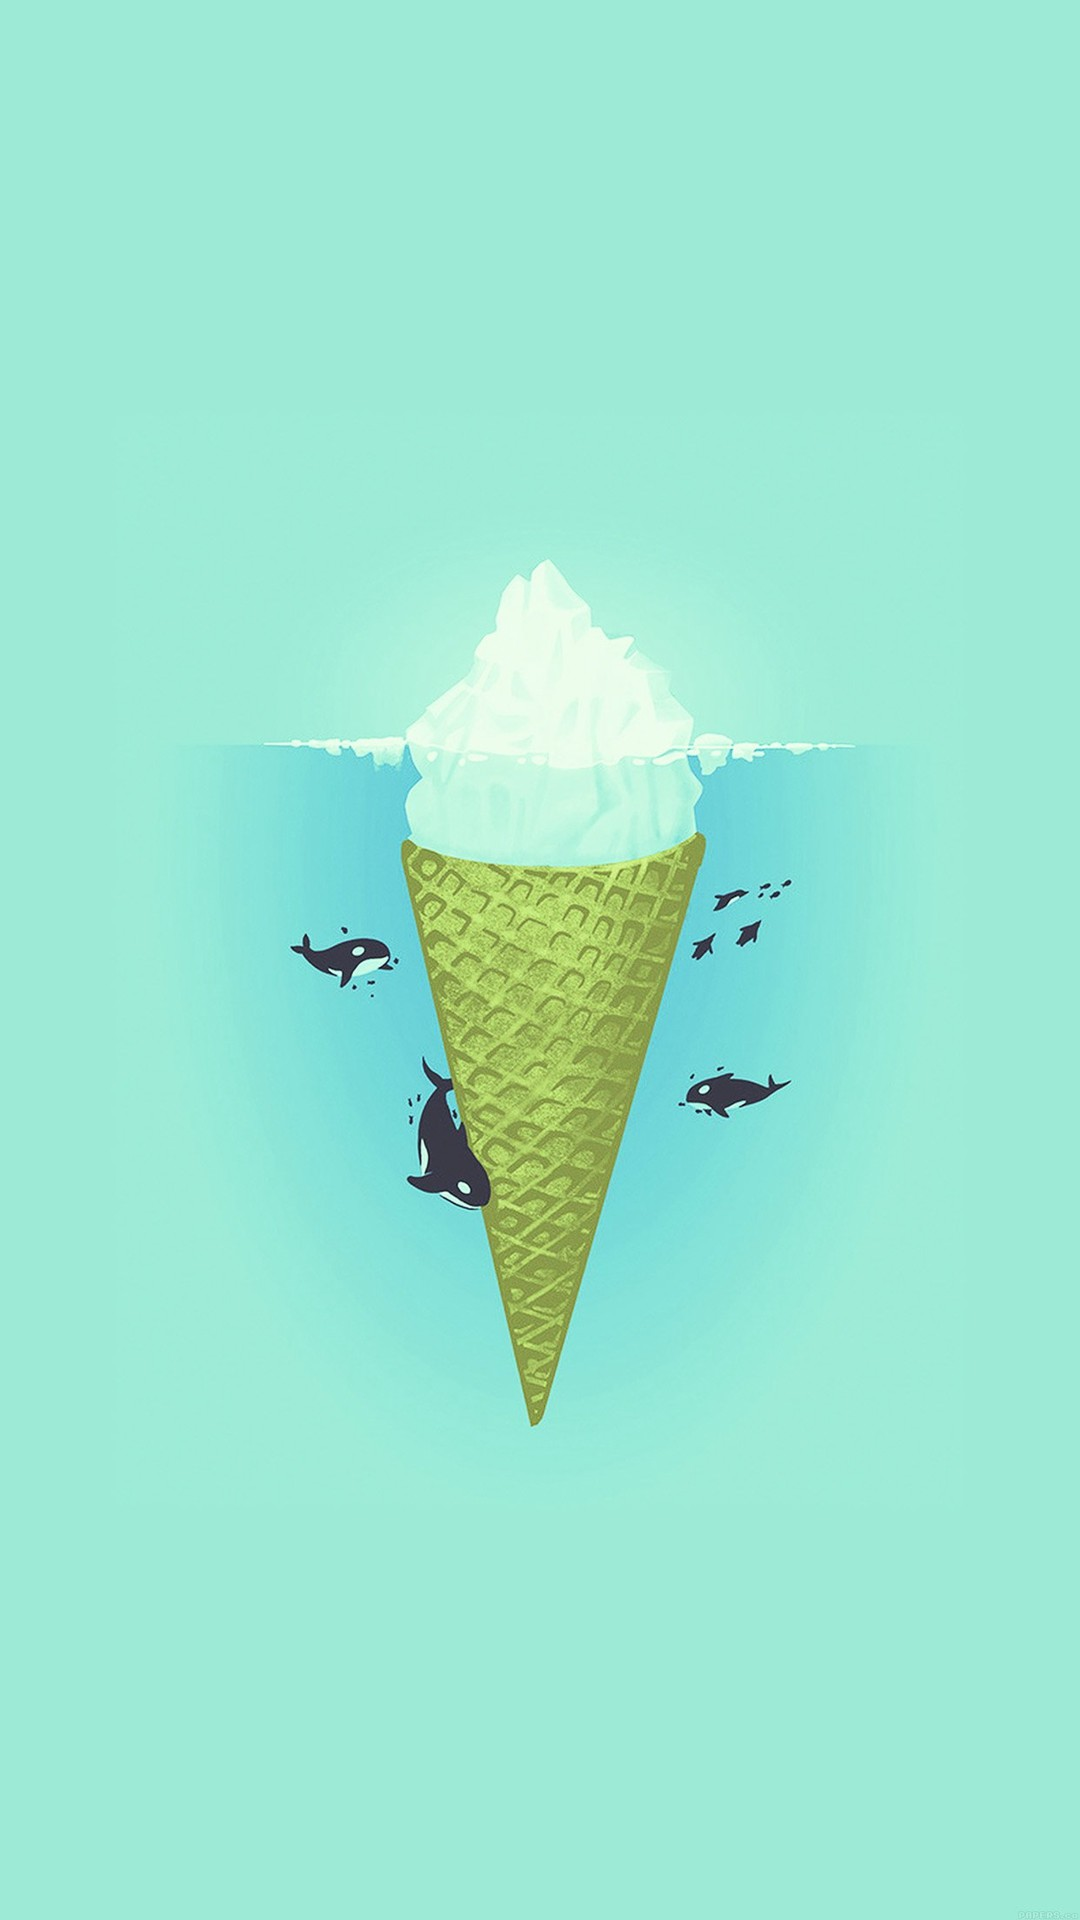 Strawberry Ice Cream – Photography Wallpaper ID 1739101 – Desktop Nexus  Abstract   I love ICE CREAM!   Pinterest   Strawberry ice cream, Strawberry  icing …